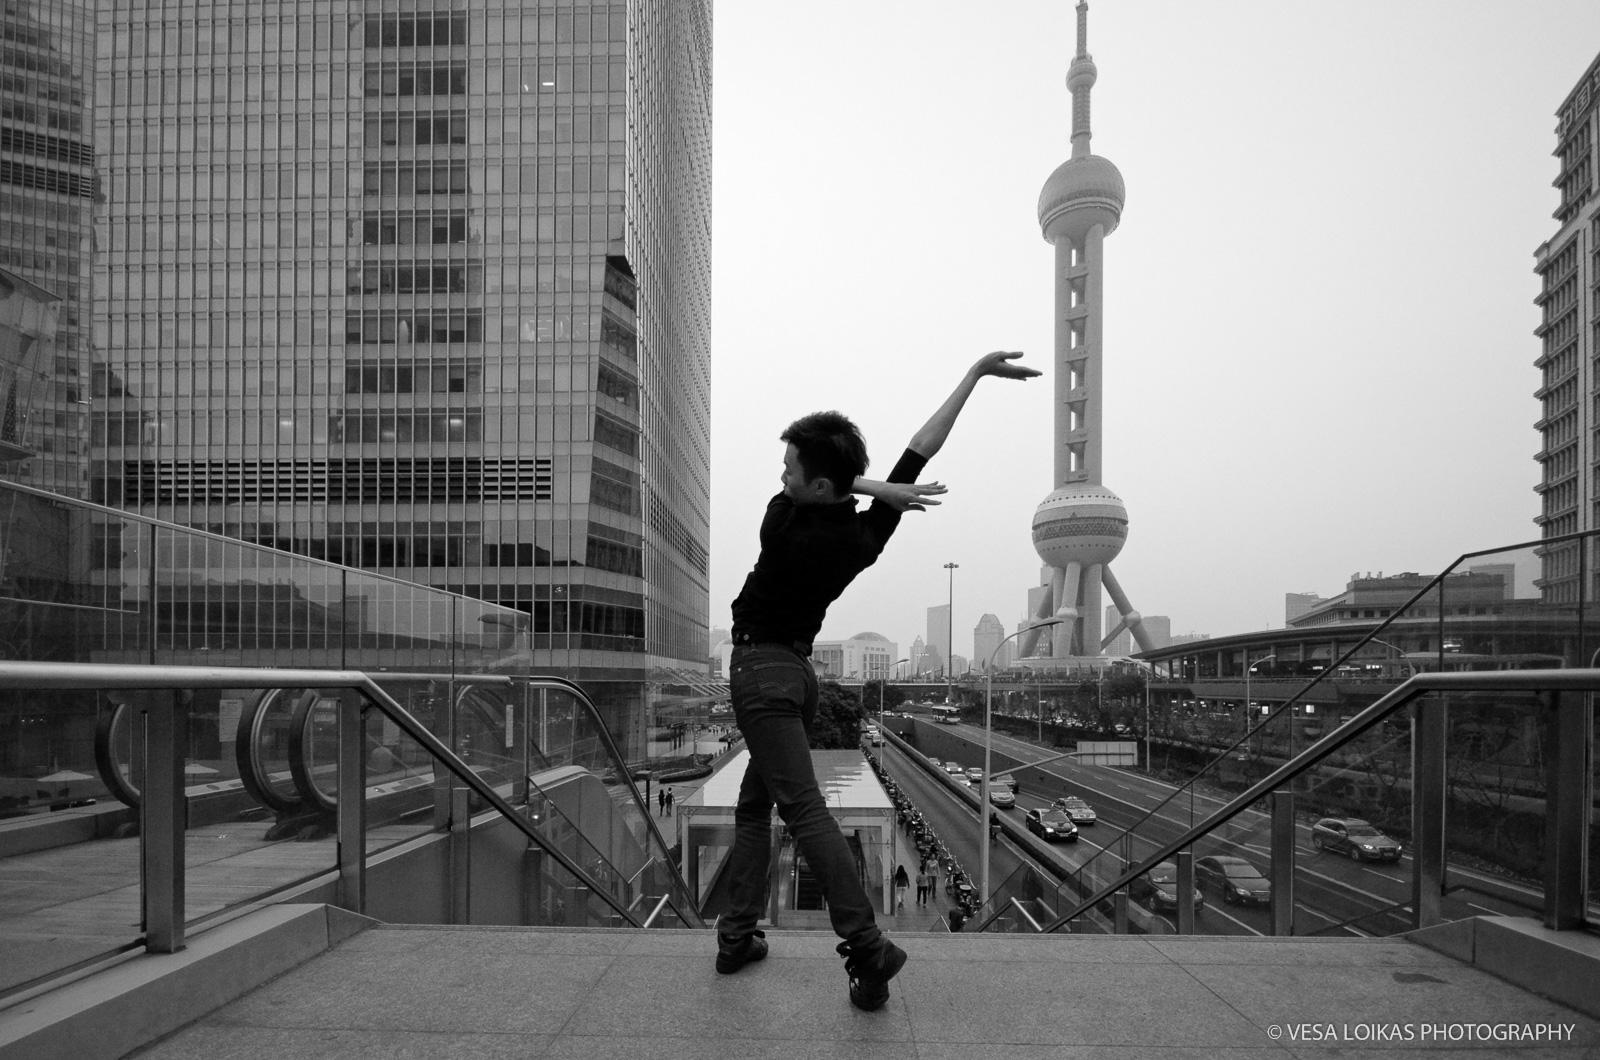 small_093-pudong_street_dance_october_26th_2014_vesa_loikas_photography.jpg